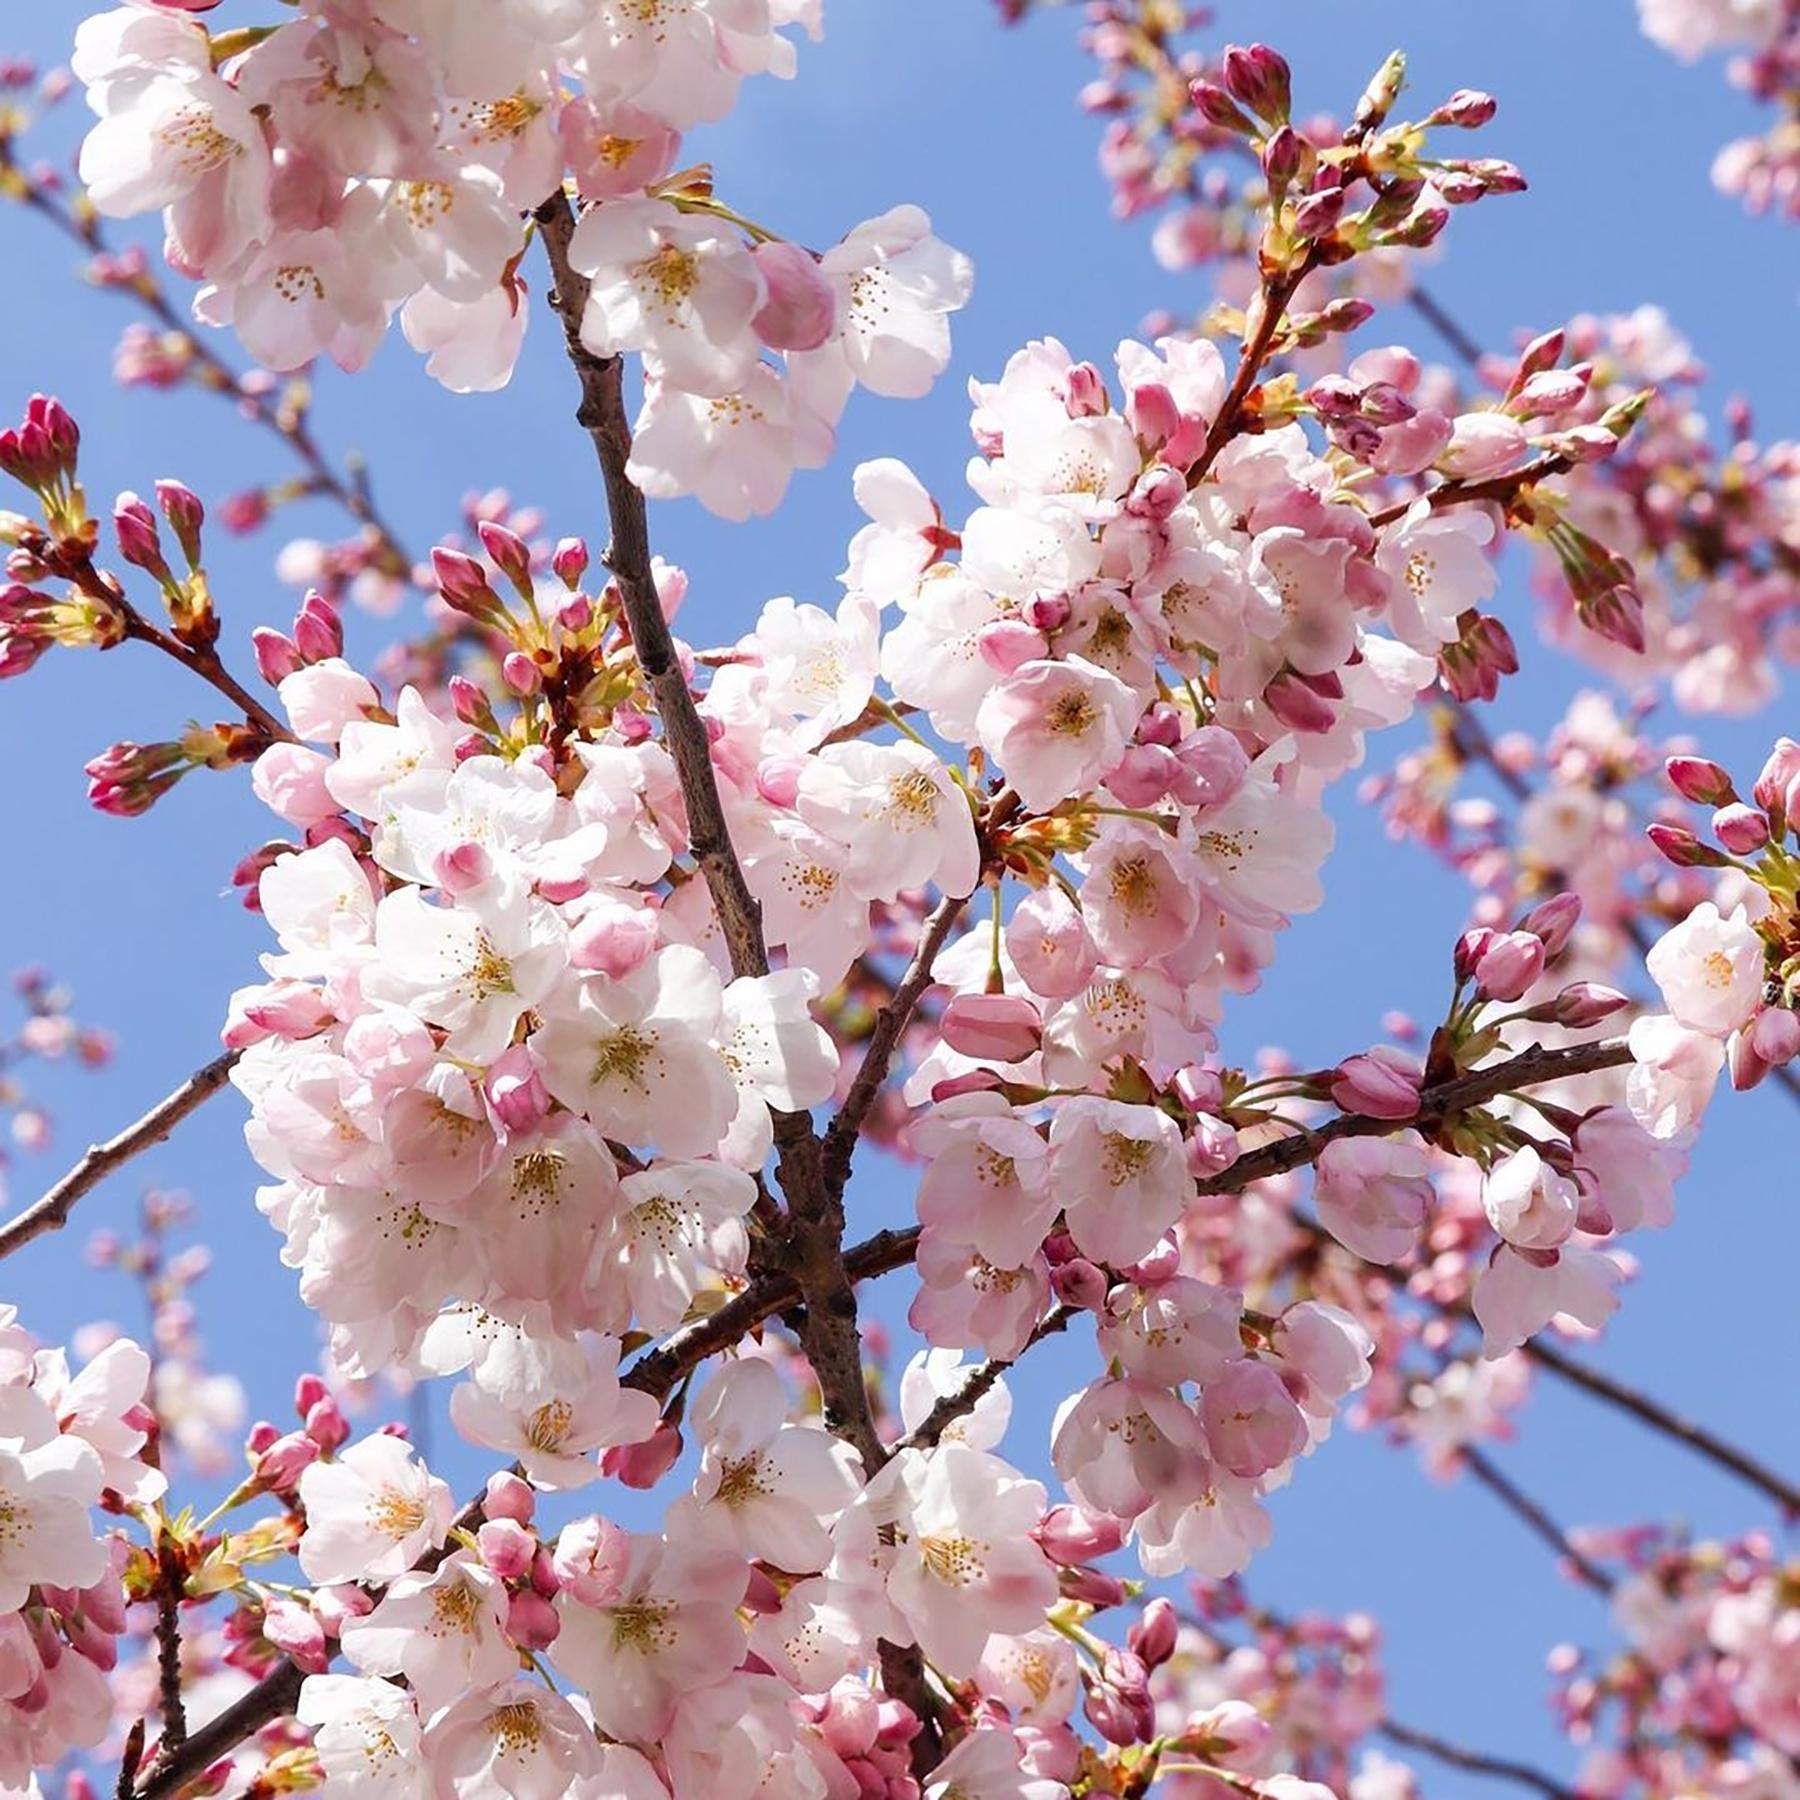 A photo of cherry blossoms budding against a blue sky.